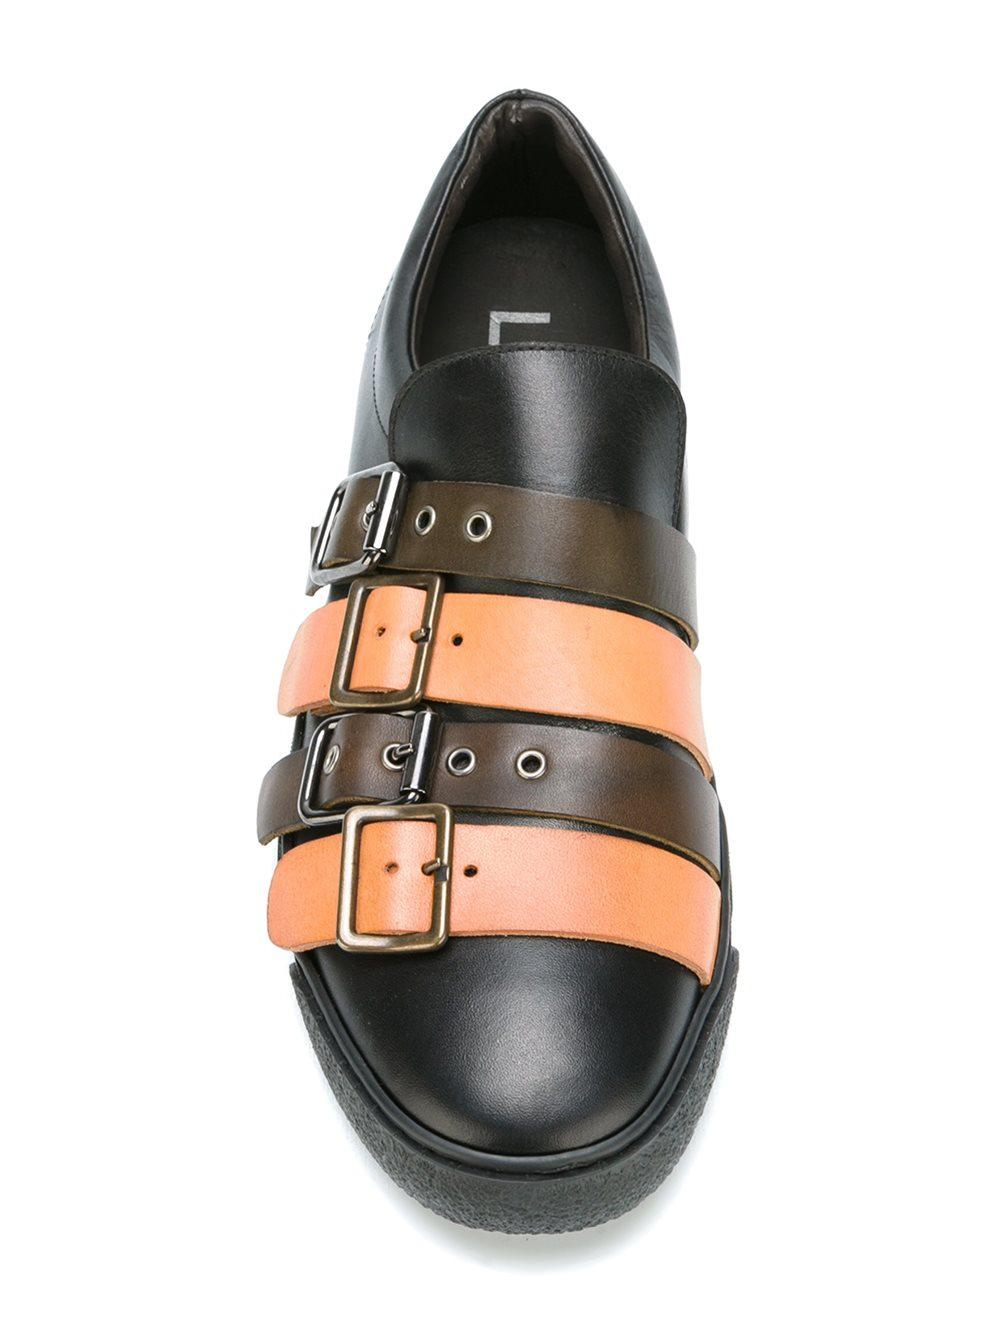 Lathbridge By Patrick Cox Leather Multi-strap Slip-on Sneakers in Black